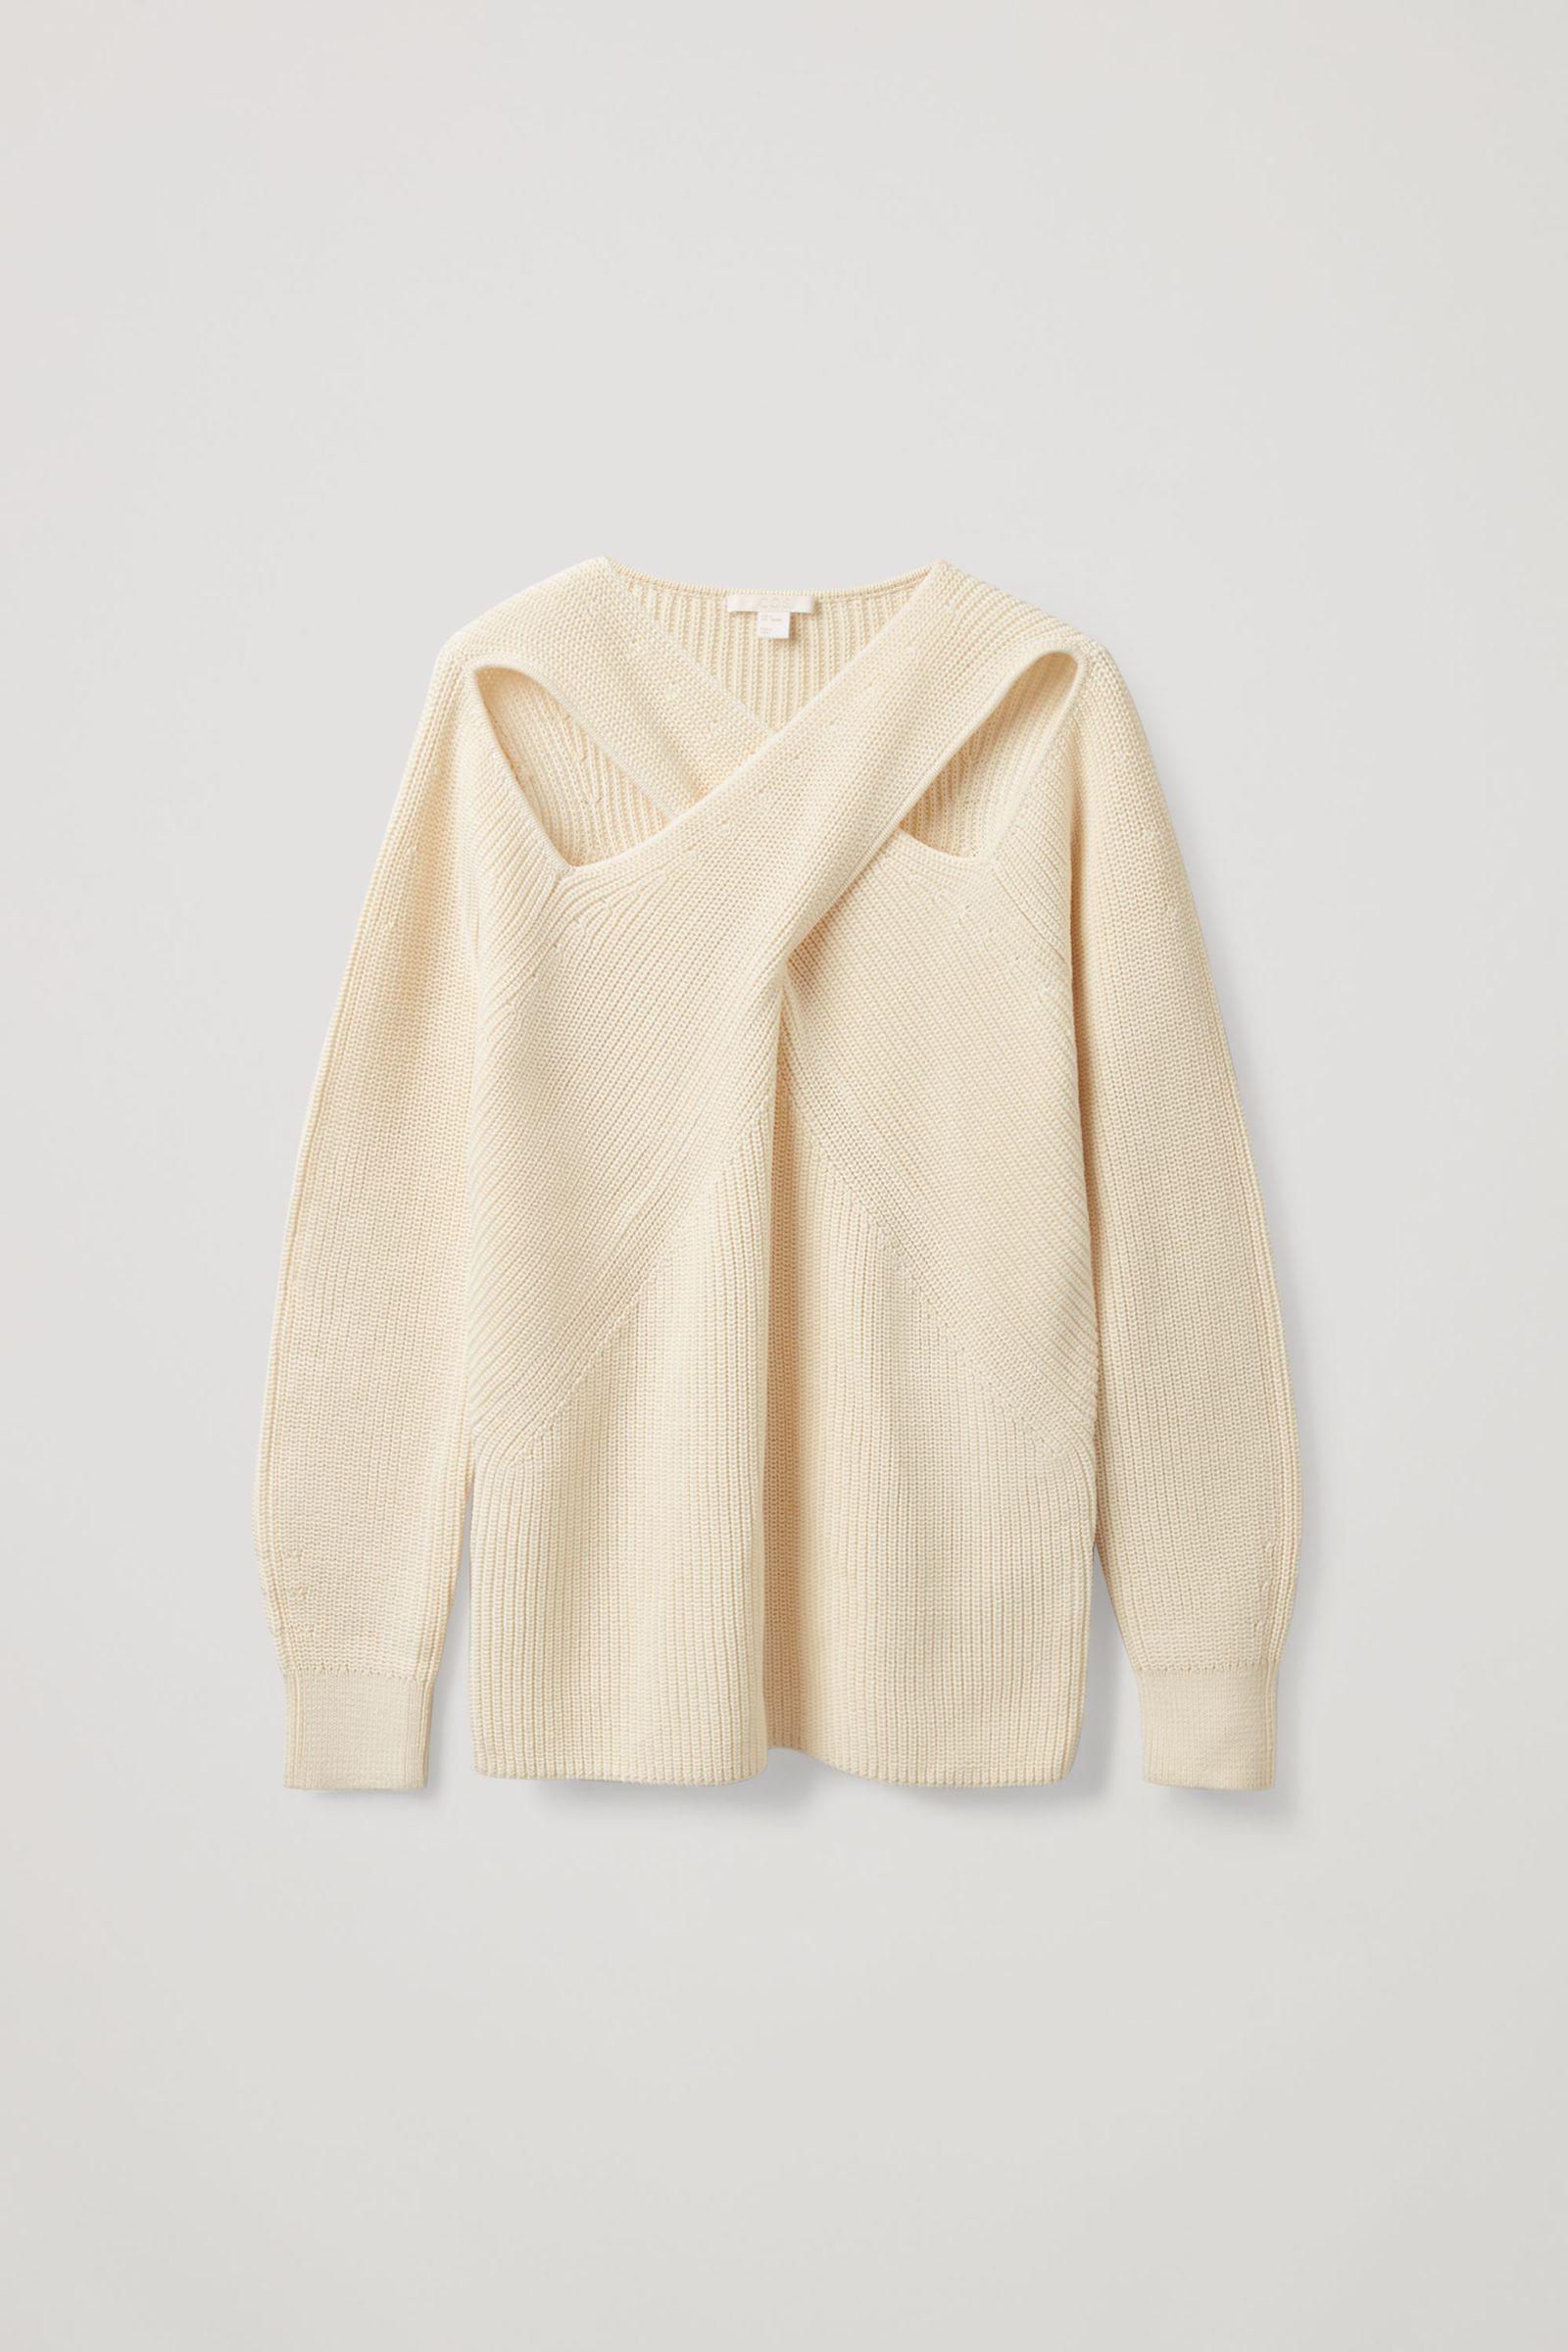 COS 코튼 드레이프드 패널 스웨터의 오프 화이트컬러 Product입니다.